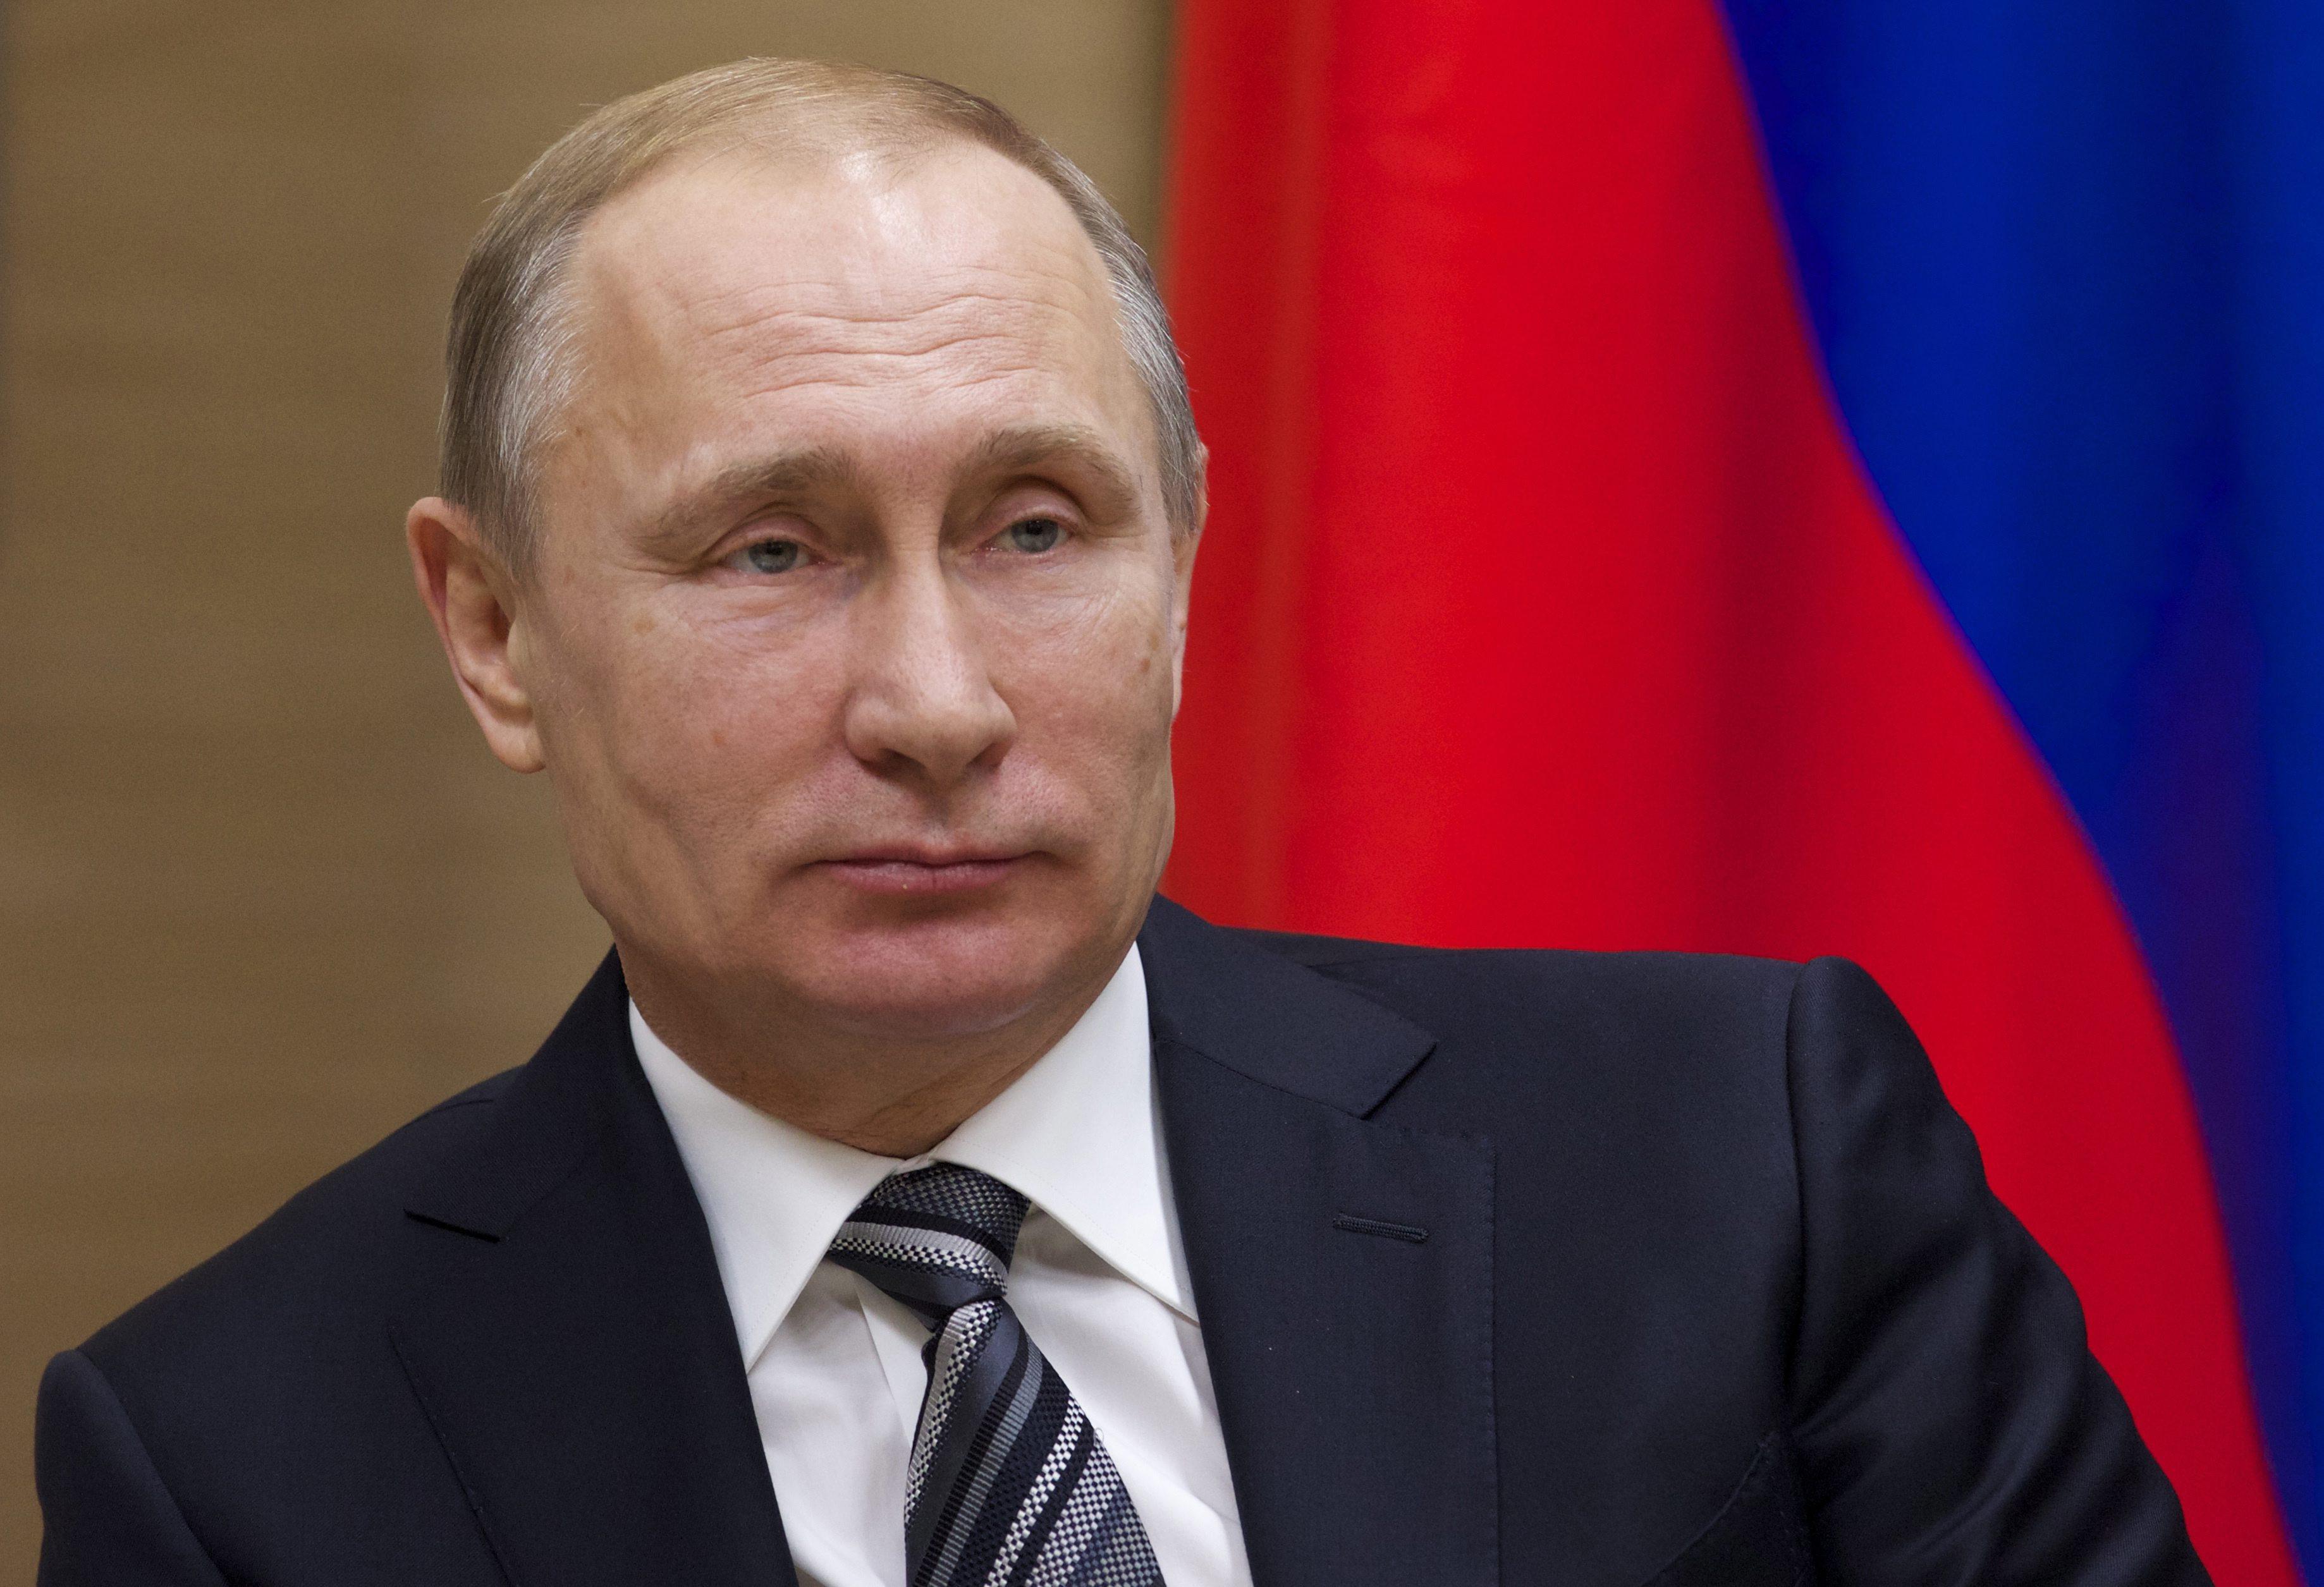 The Telegraph: Strategia Rusiei pentru a dezbina UE. Tarile europene unde Kremlinul a infiltrat mai multe partide